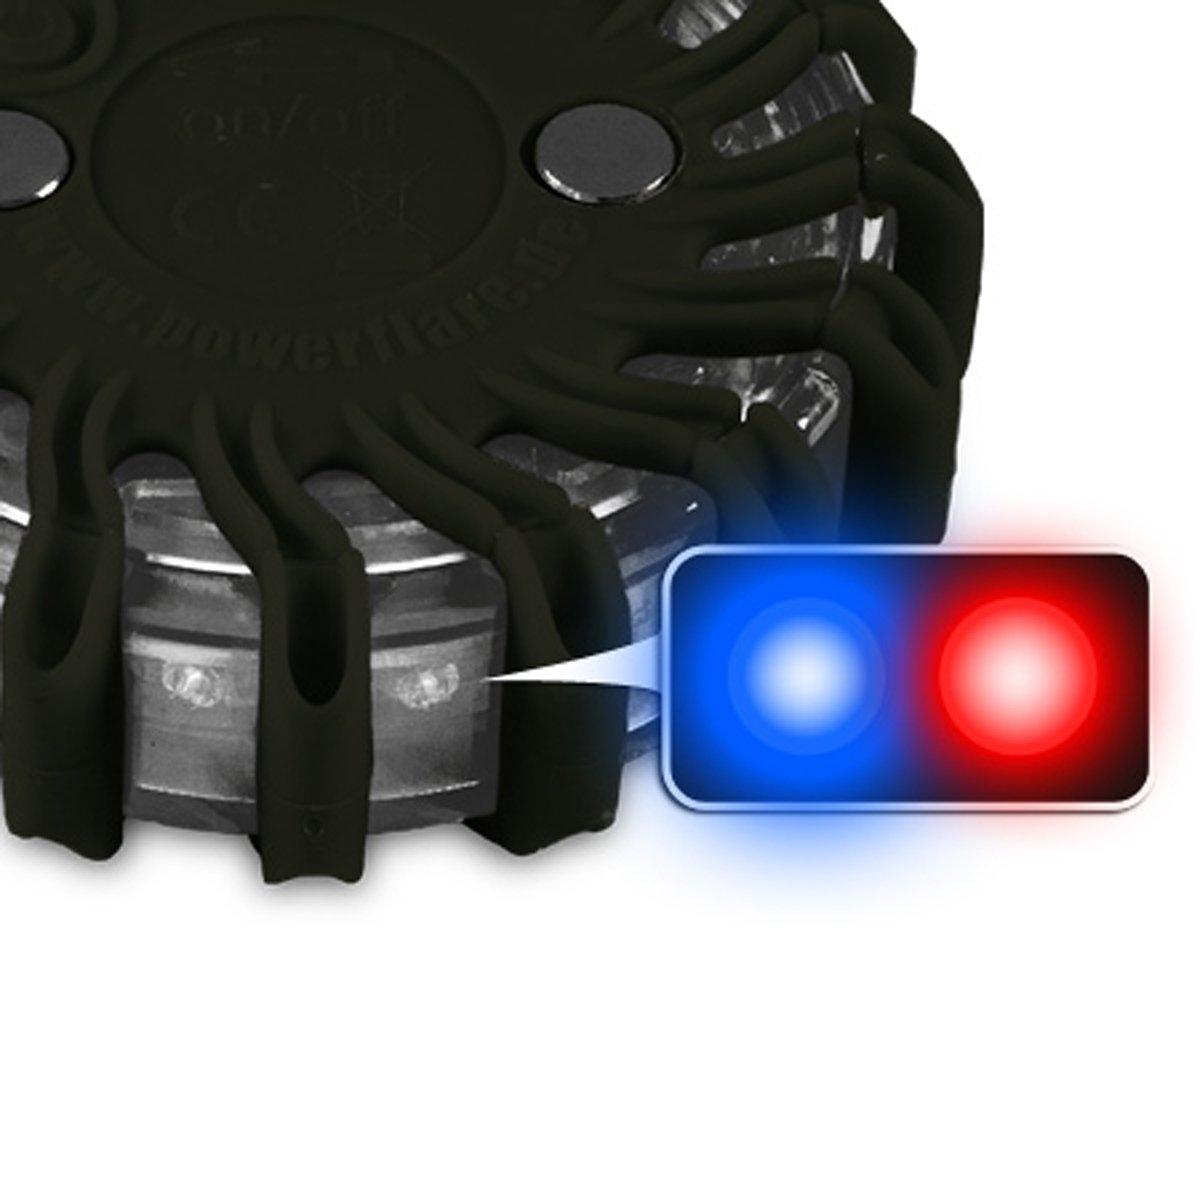 Powerflare LED Batterie Warnleuchte in rot